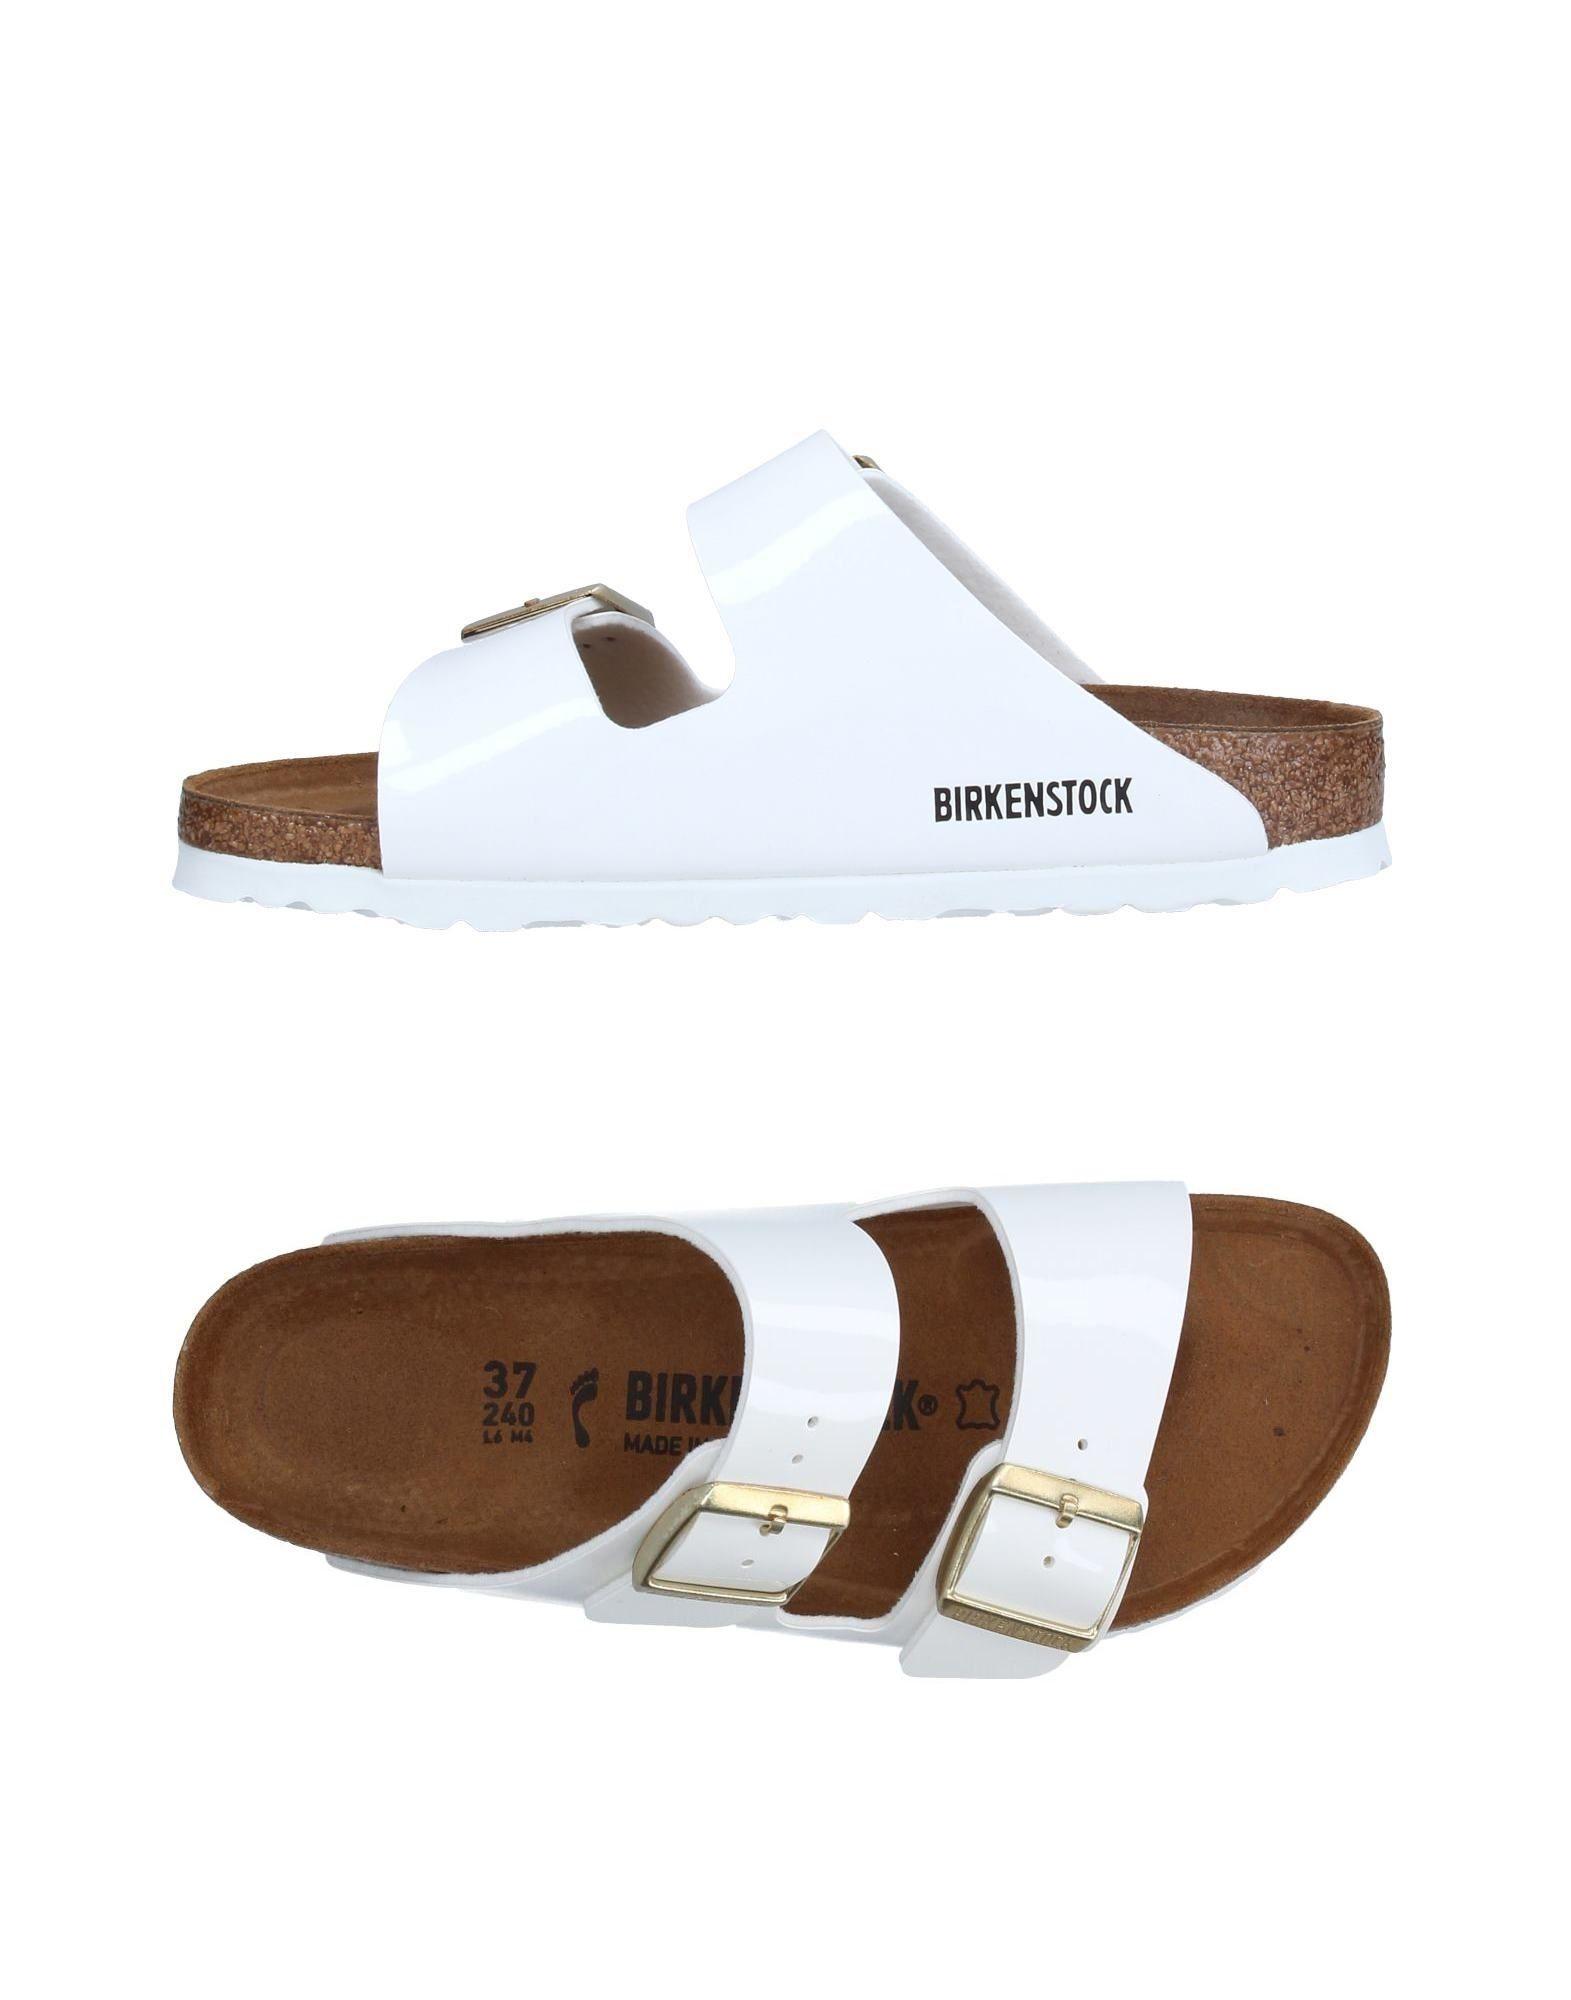 Birkenstock Sandalen Damen  11214951HO Gute Qualität beliebte Schuhe